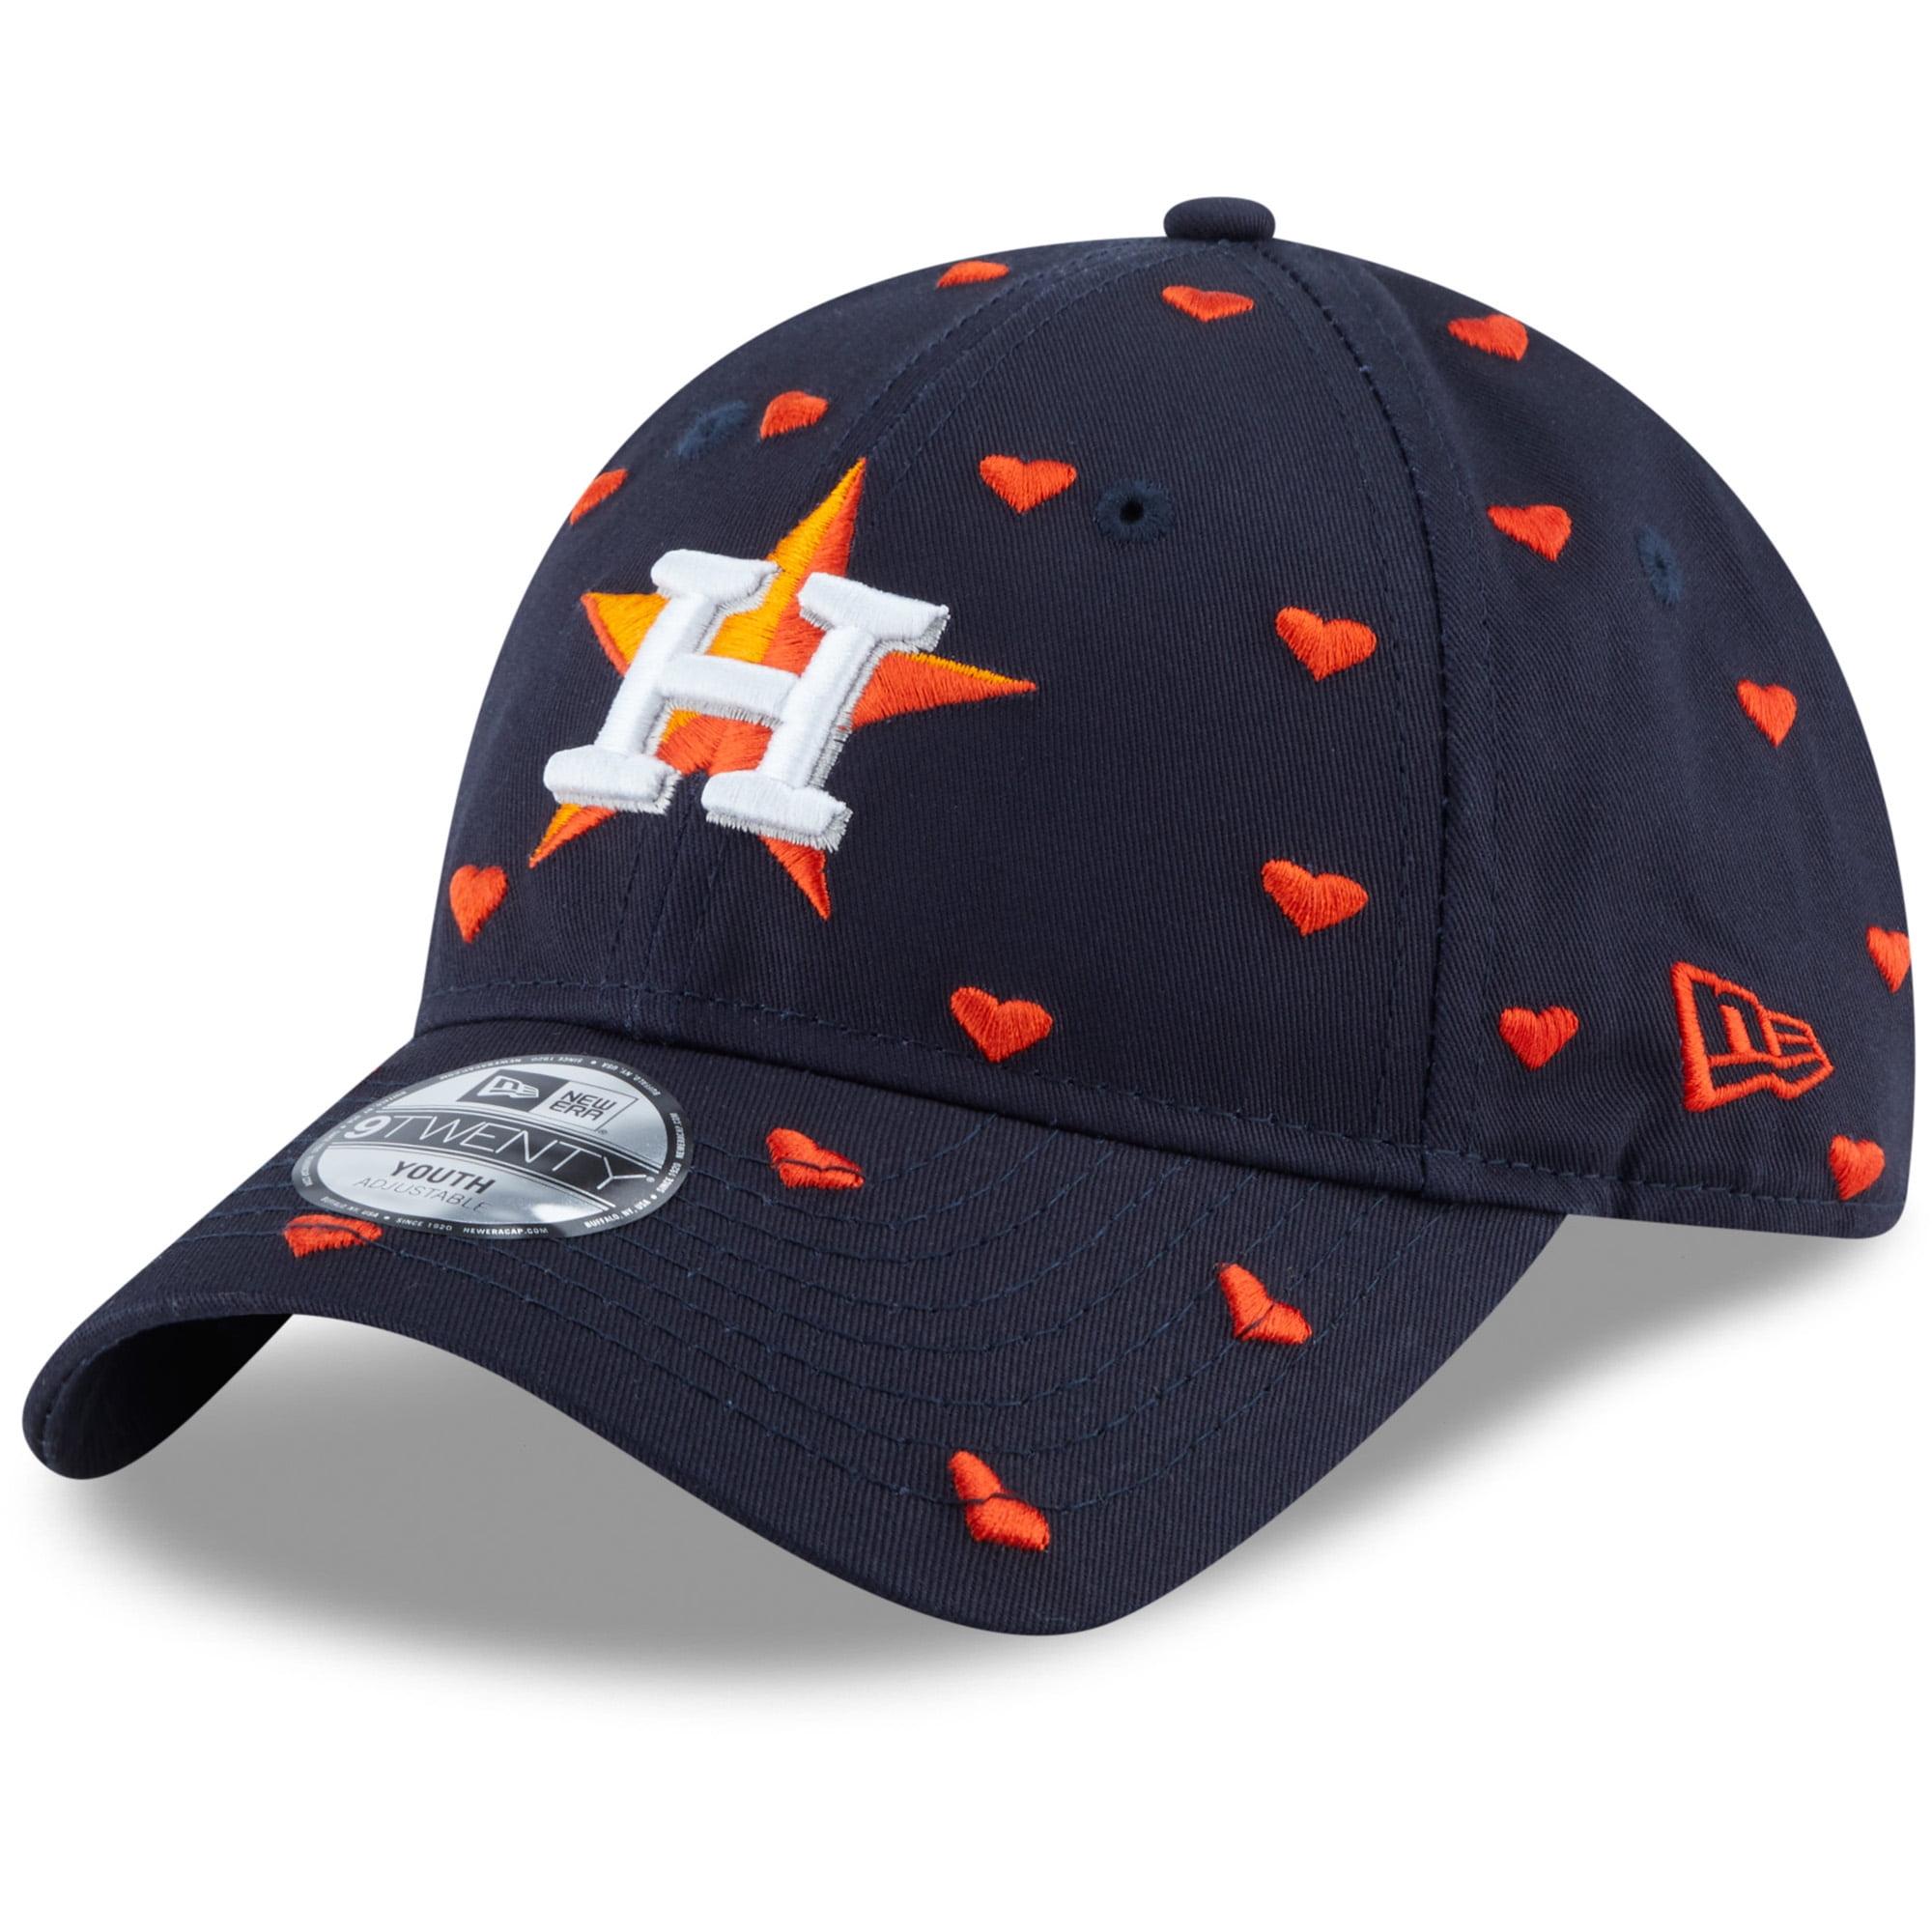 Houston Astros New Era Youth Lovely Fan 9TWENTY Adjustable Hat - Navy - OSFA